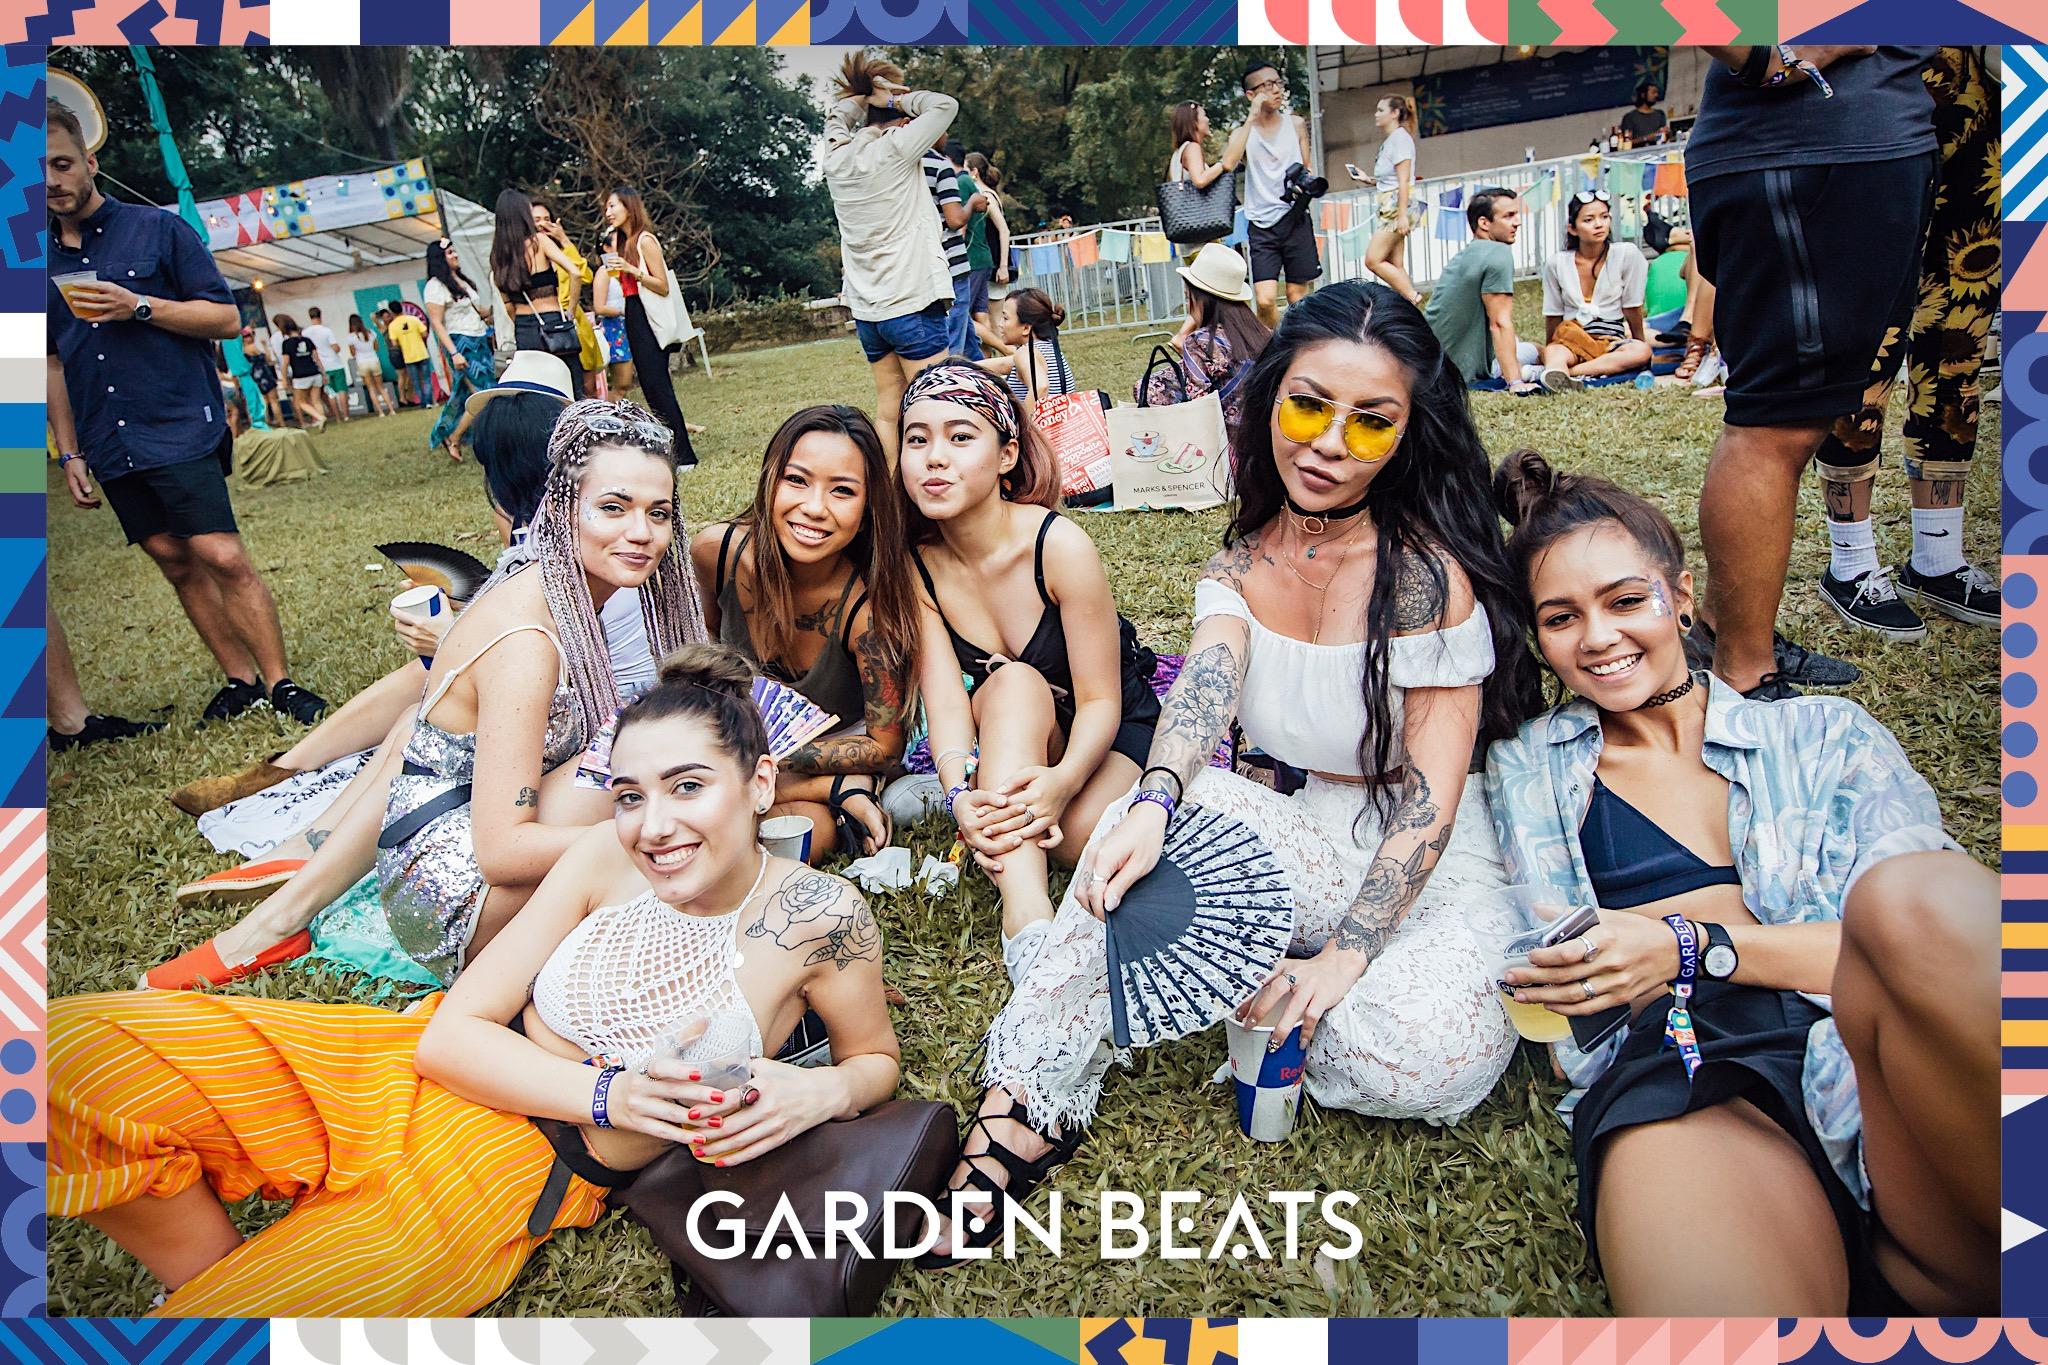 18032017_GardenBeats_Colossal628_WatermarkedGB.jpg